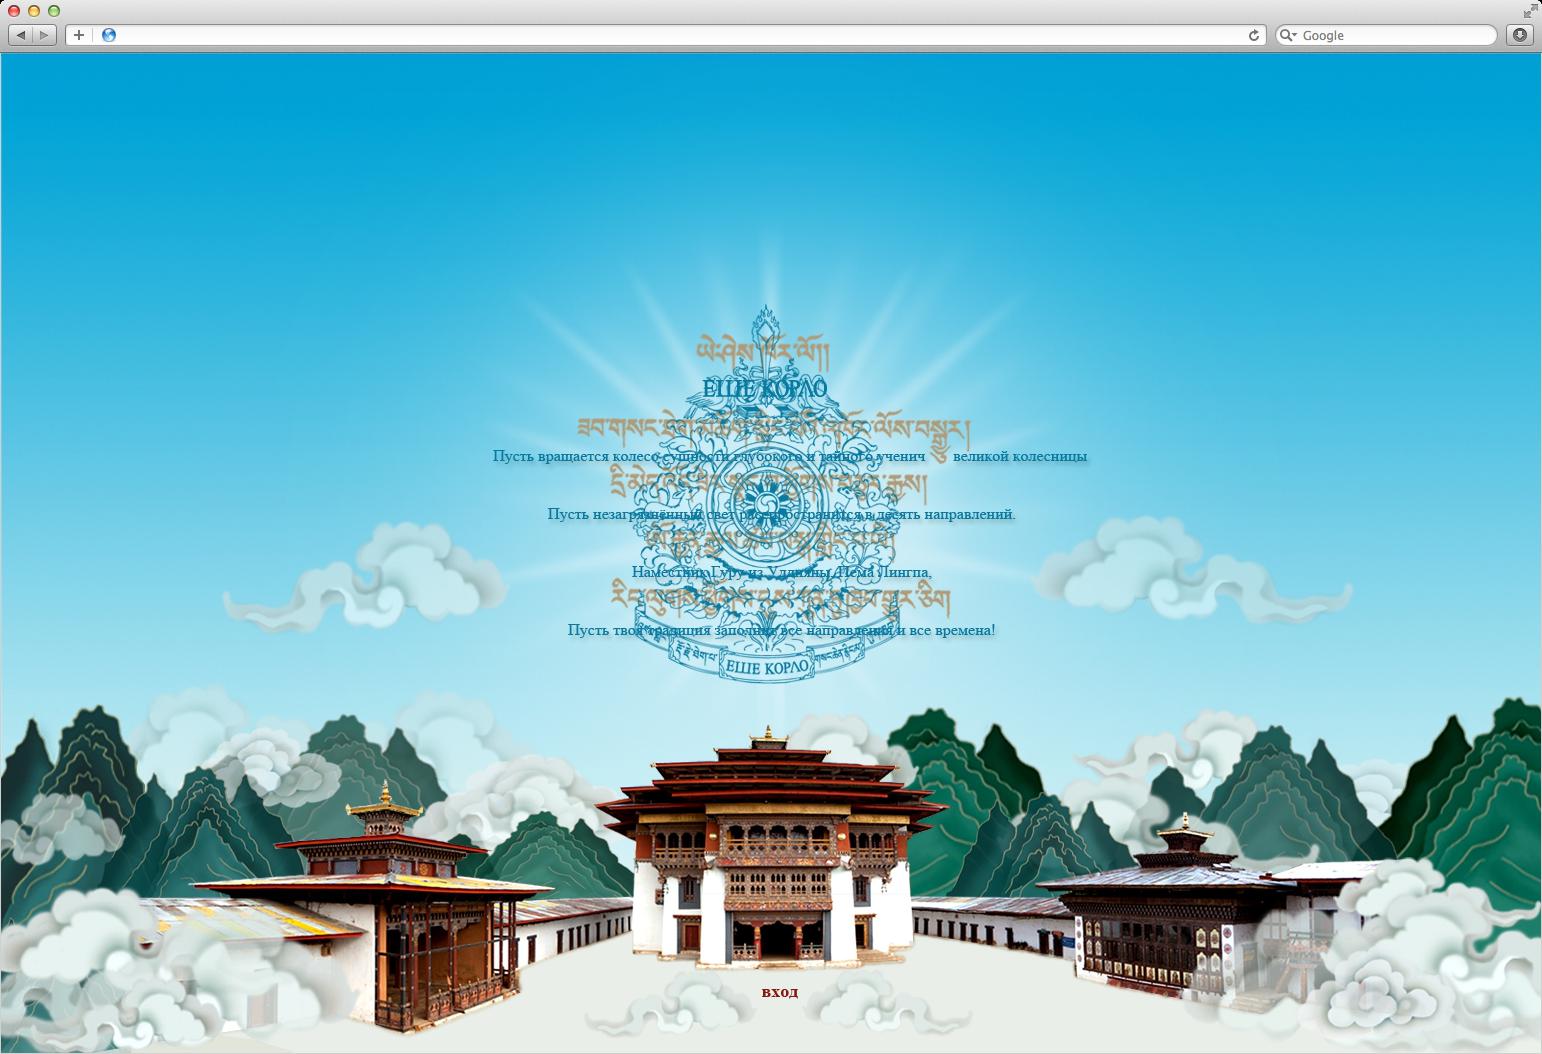 Сайт московского буддийского центра (2013 г.)